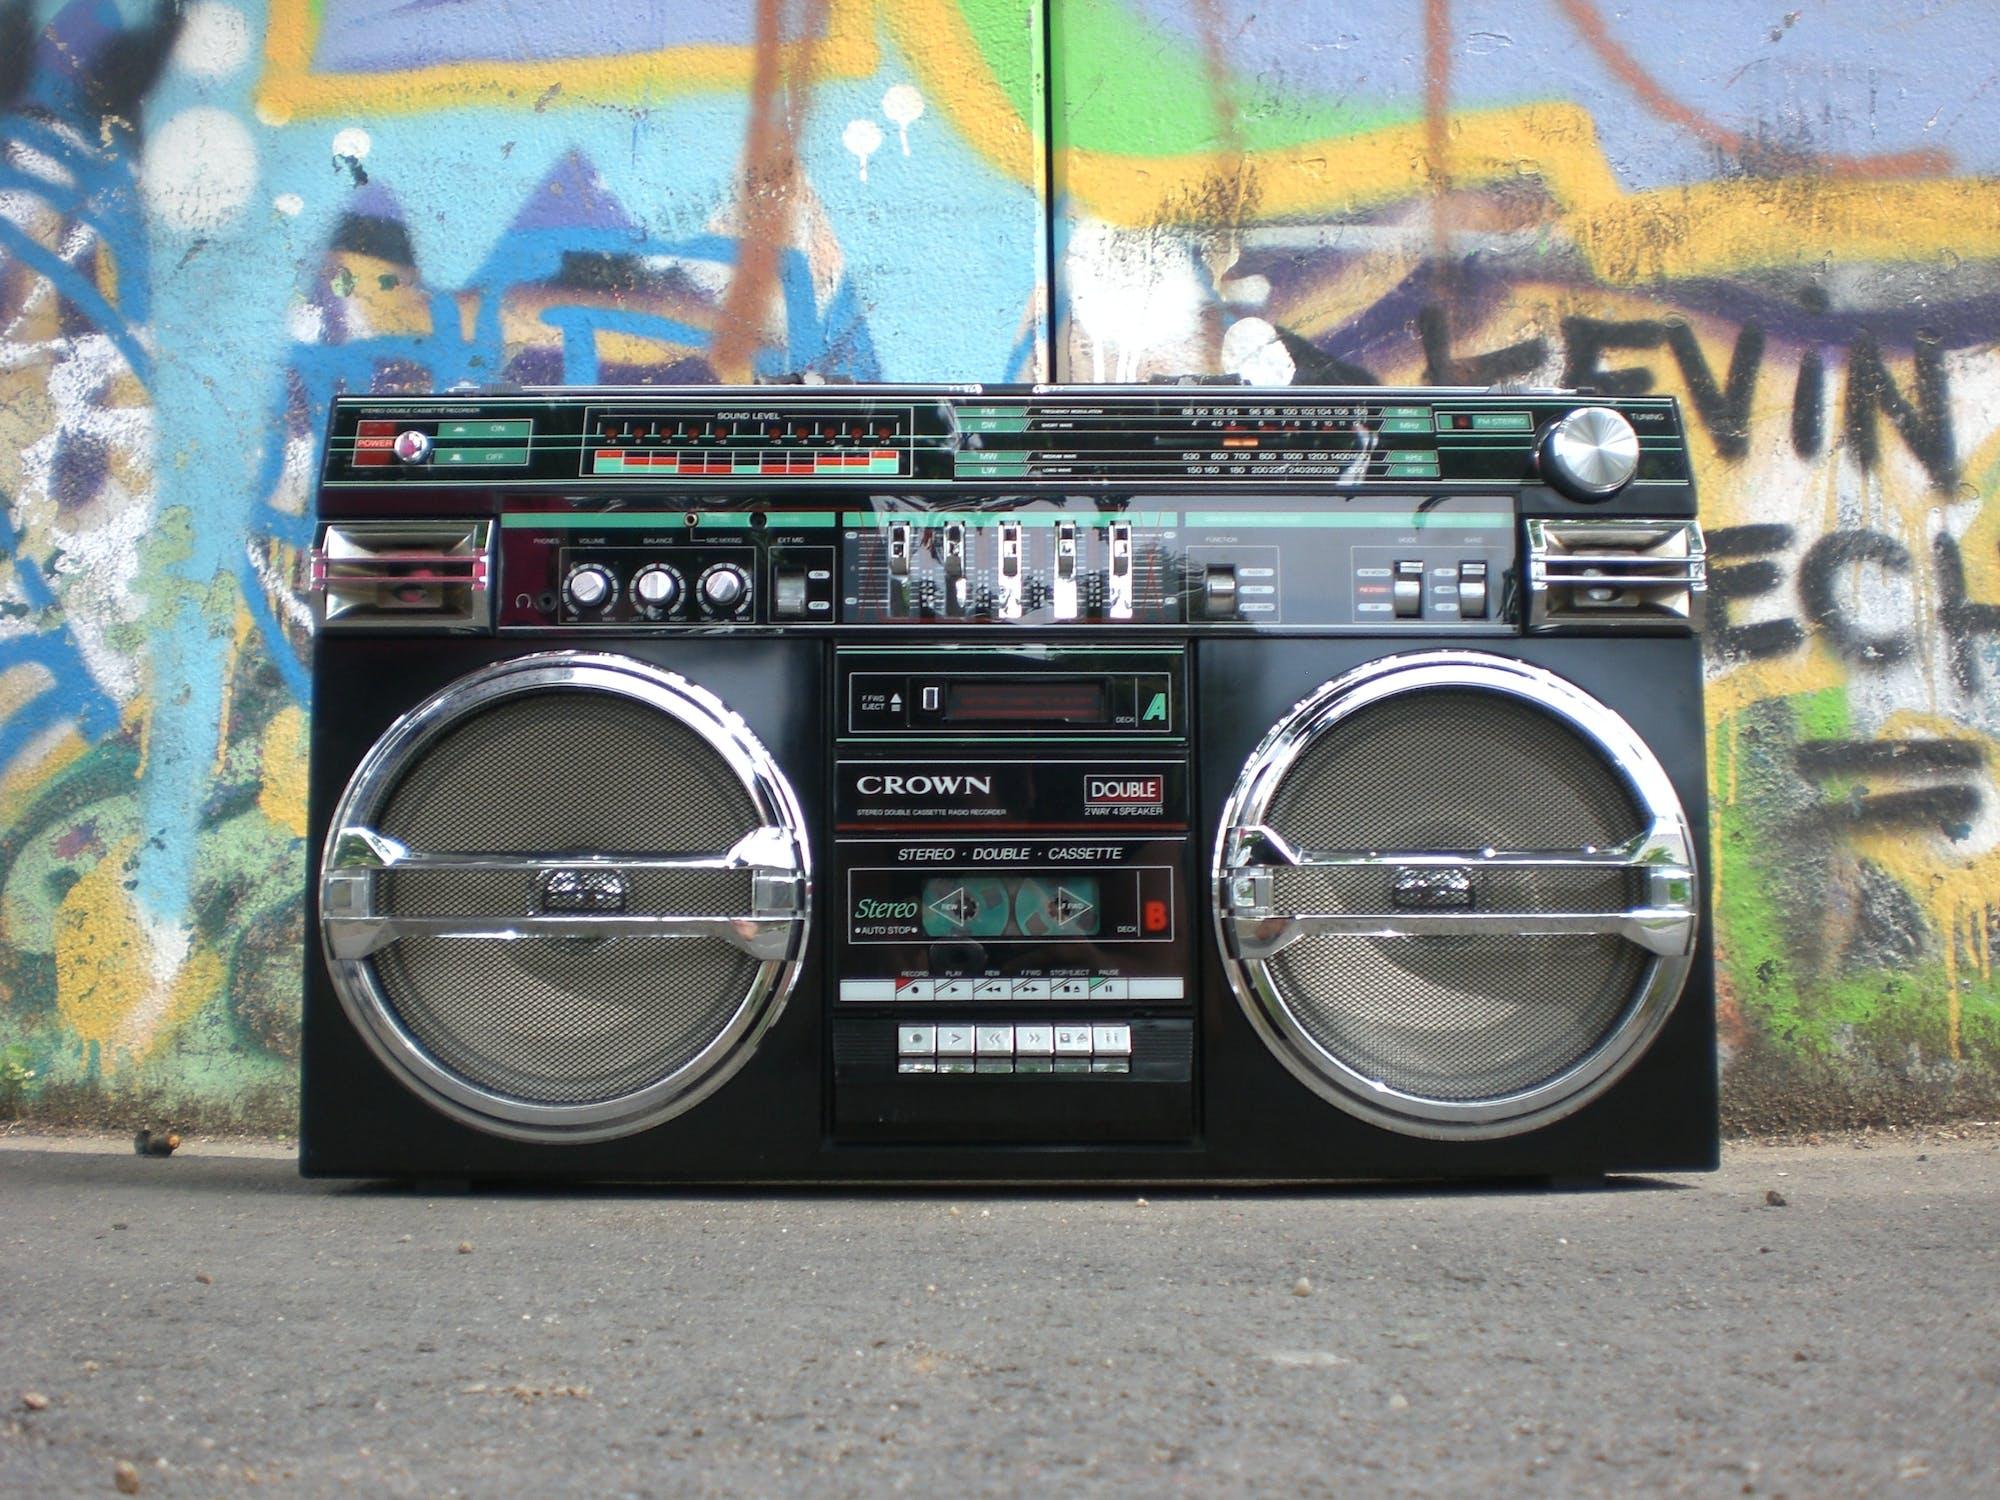 Hiphop / R&B